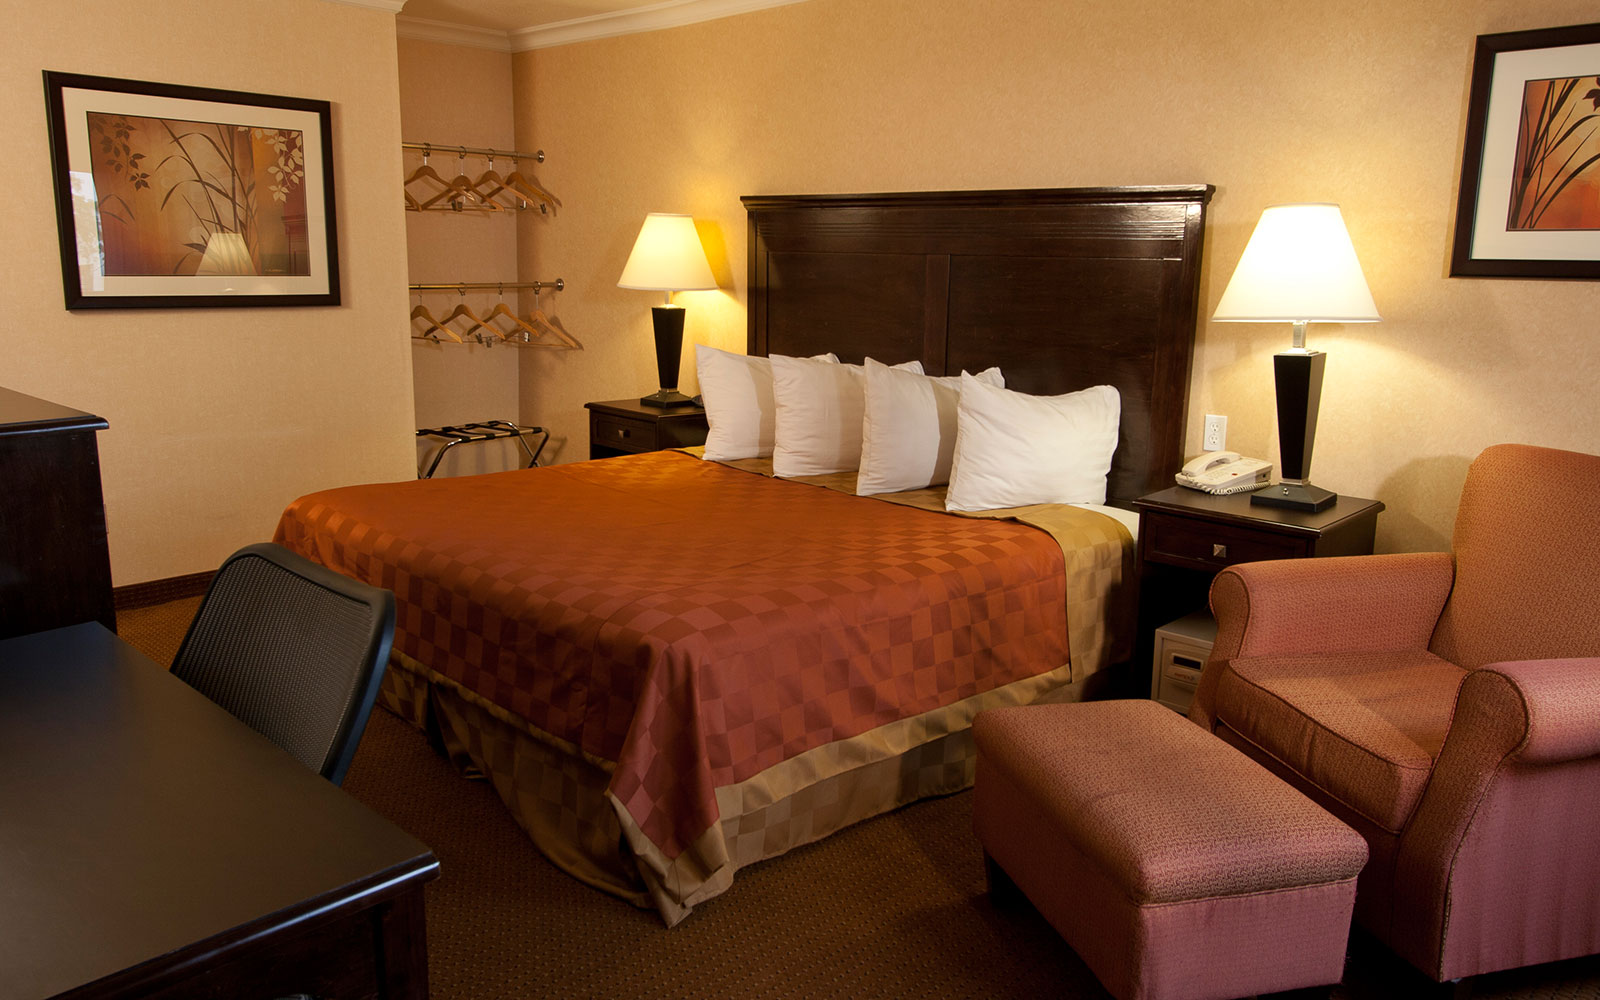 Pasadena California Hotel Deals Vagabond Inn Pasadena